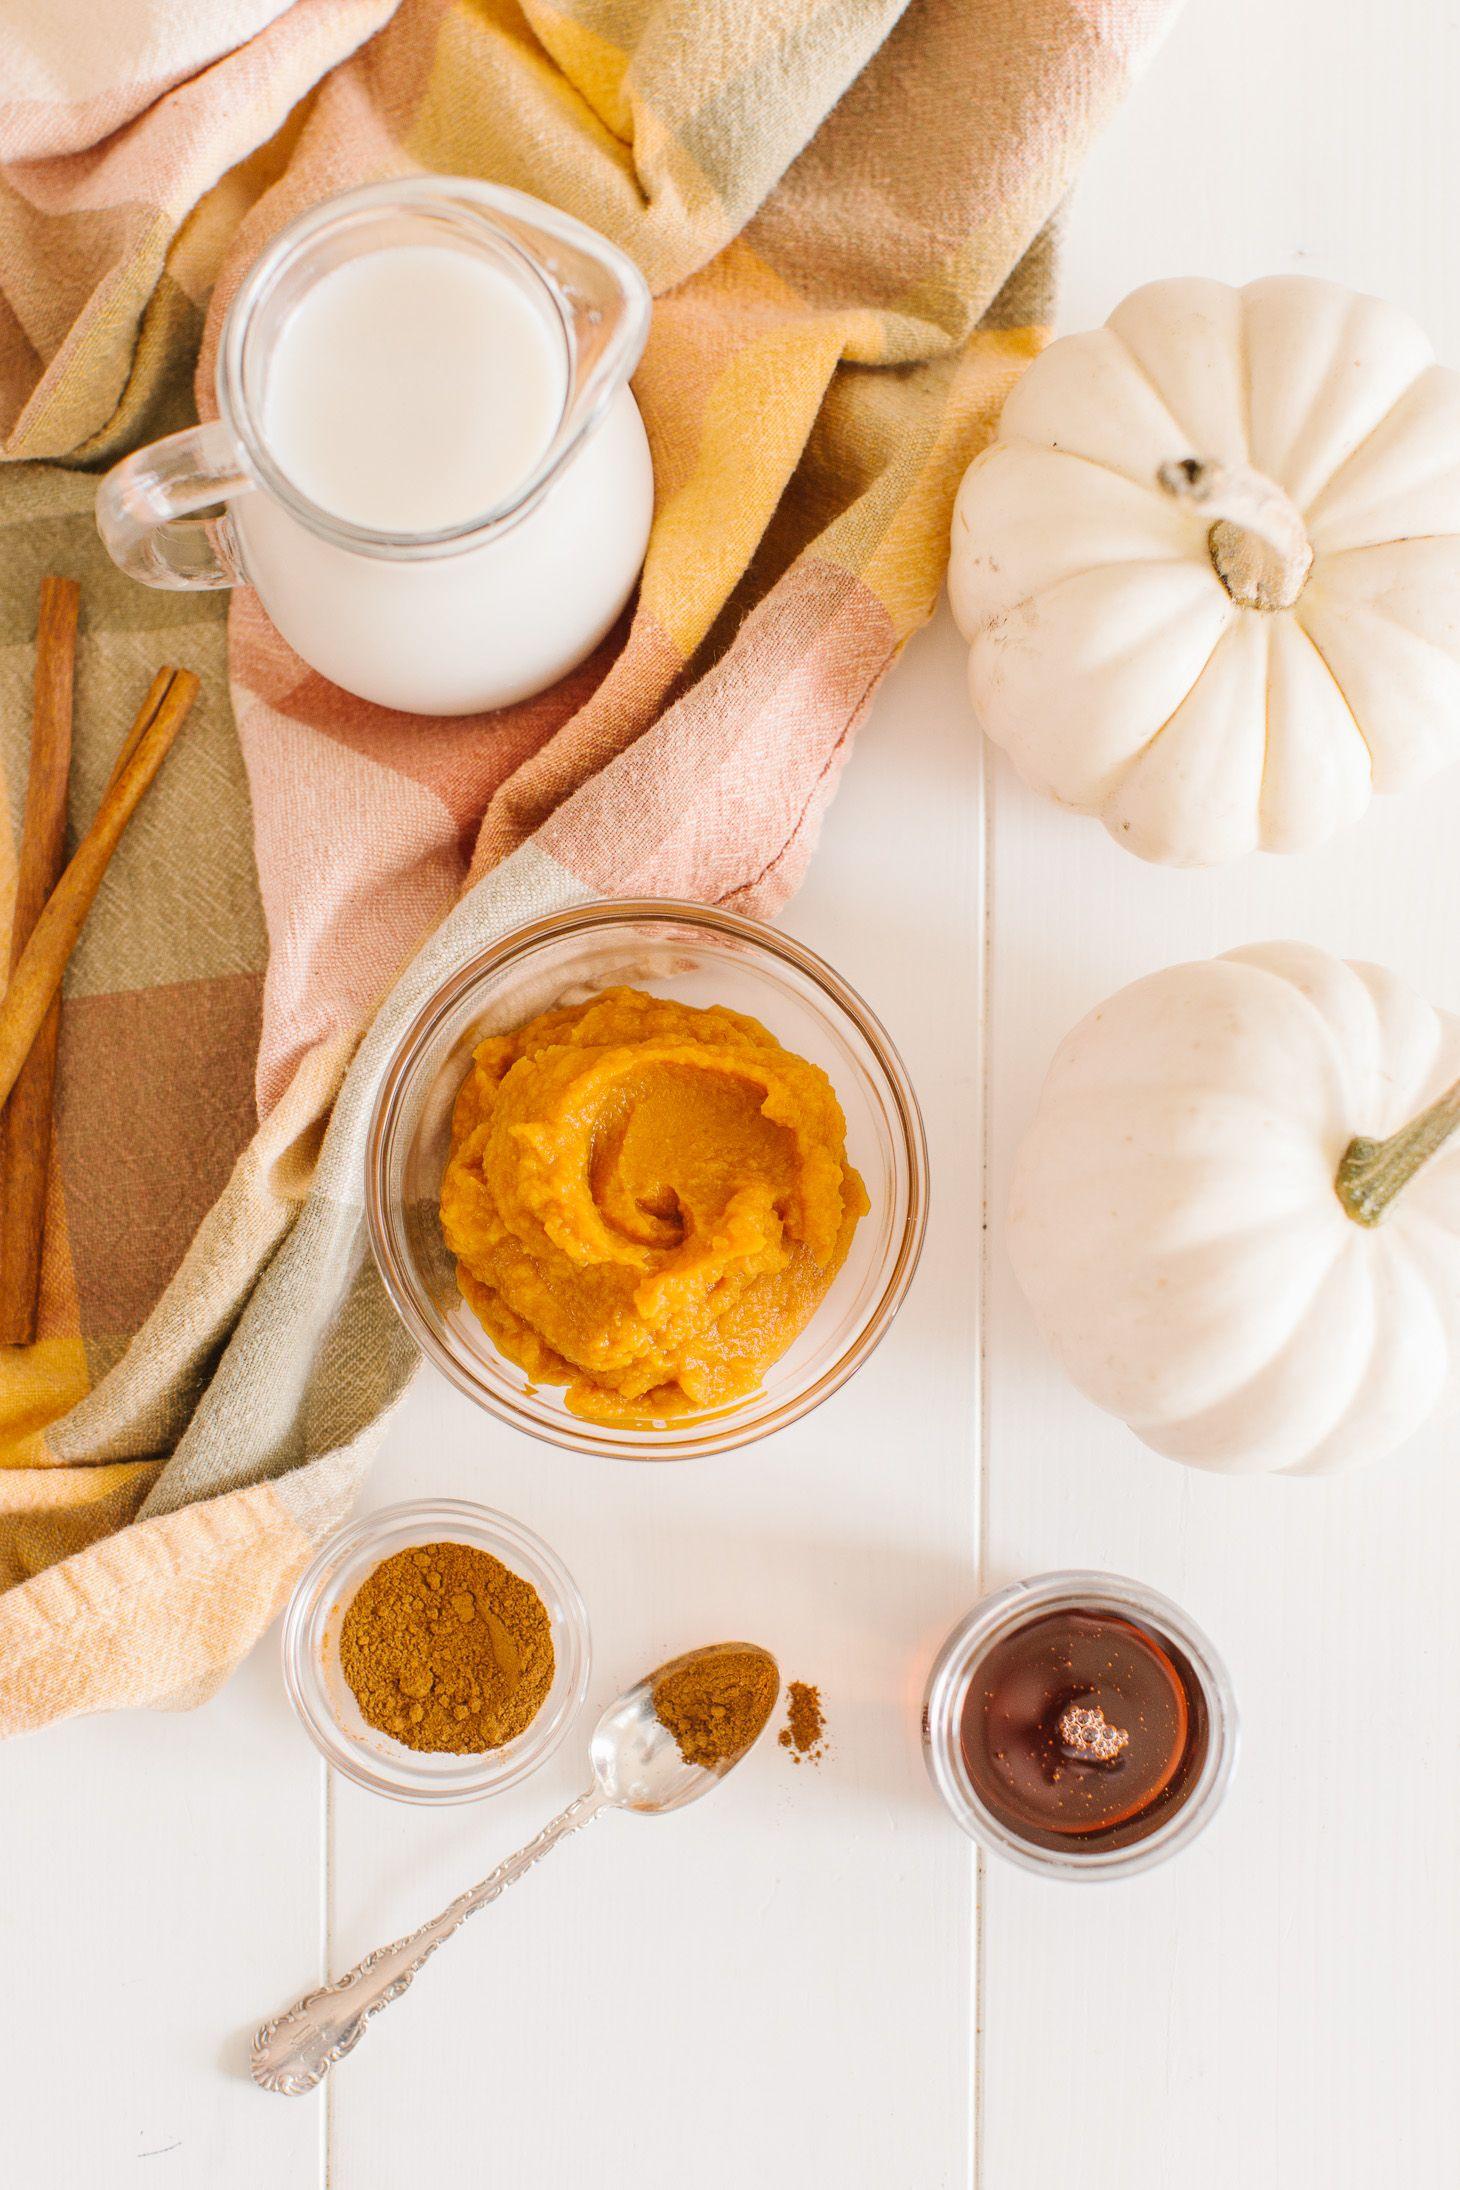 Scrumptious Pumpkin Spice Steamer Recipe With Images Vegan Pumpkin Spice Pumpkin Spice Vegan Pumpkin Spice Latte